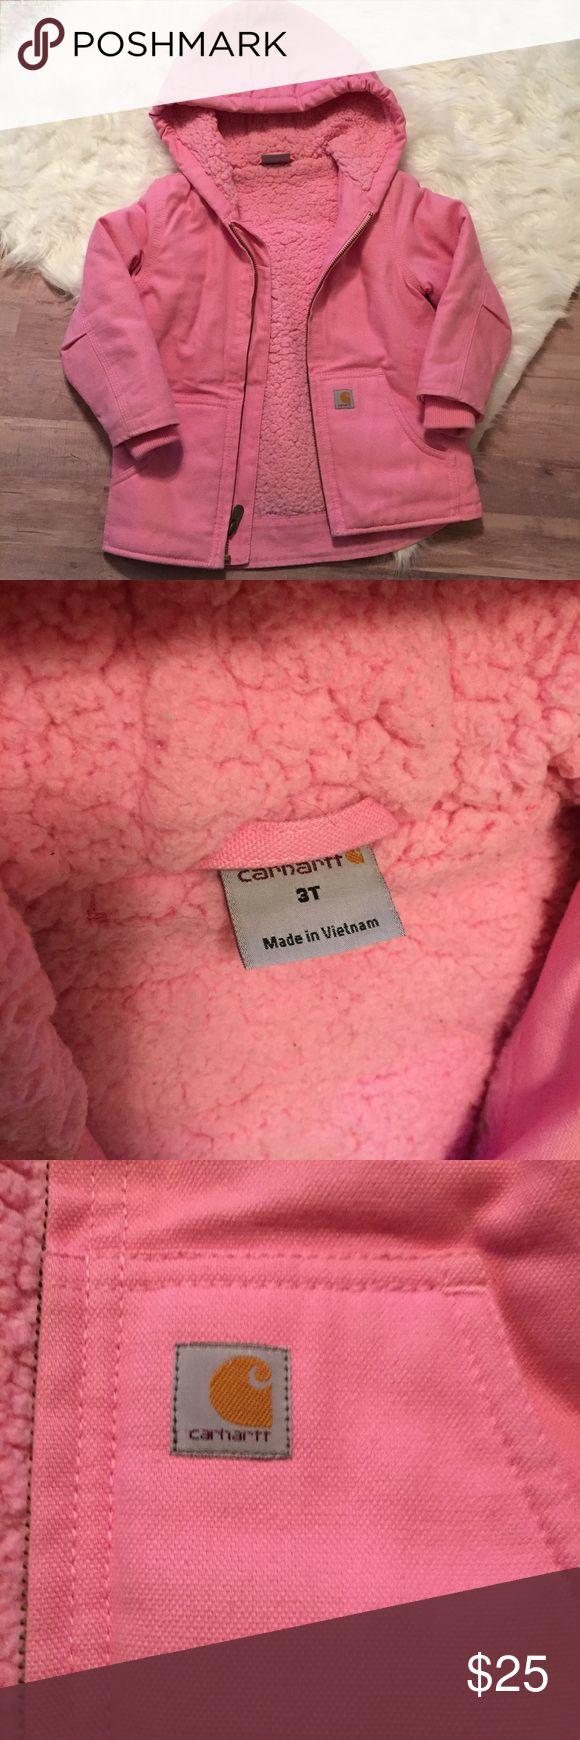 Carhartt pink 3T winter coat (Like New) Like New Carhartt winter jacket. 3T, no wear. So cute and incredibly warm! Carhartt Jackets & Coats